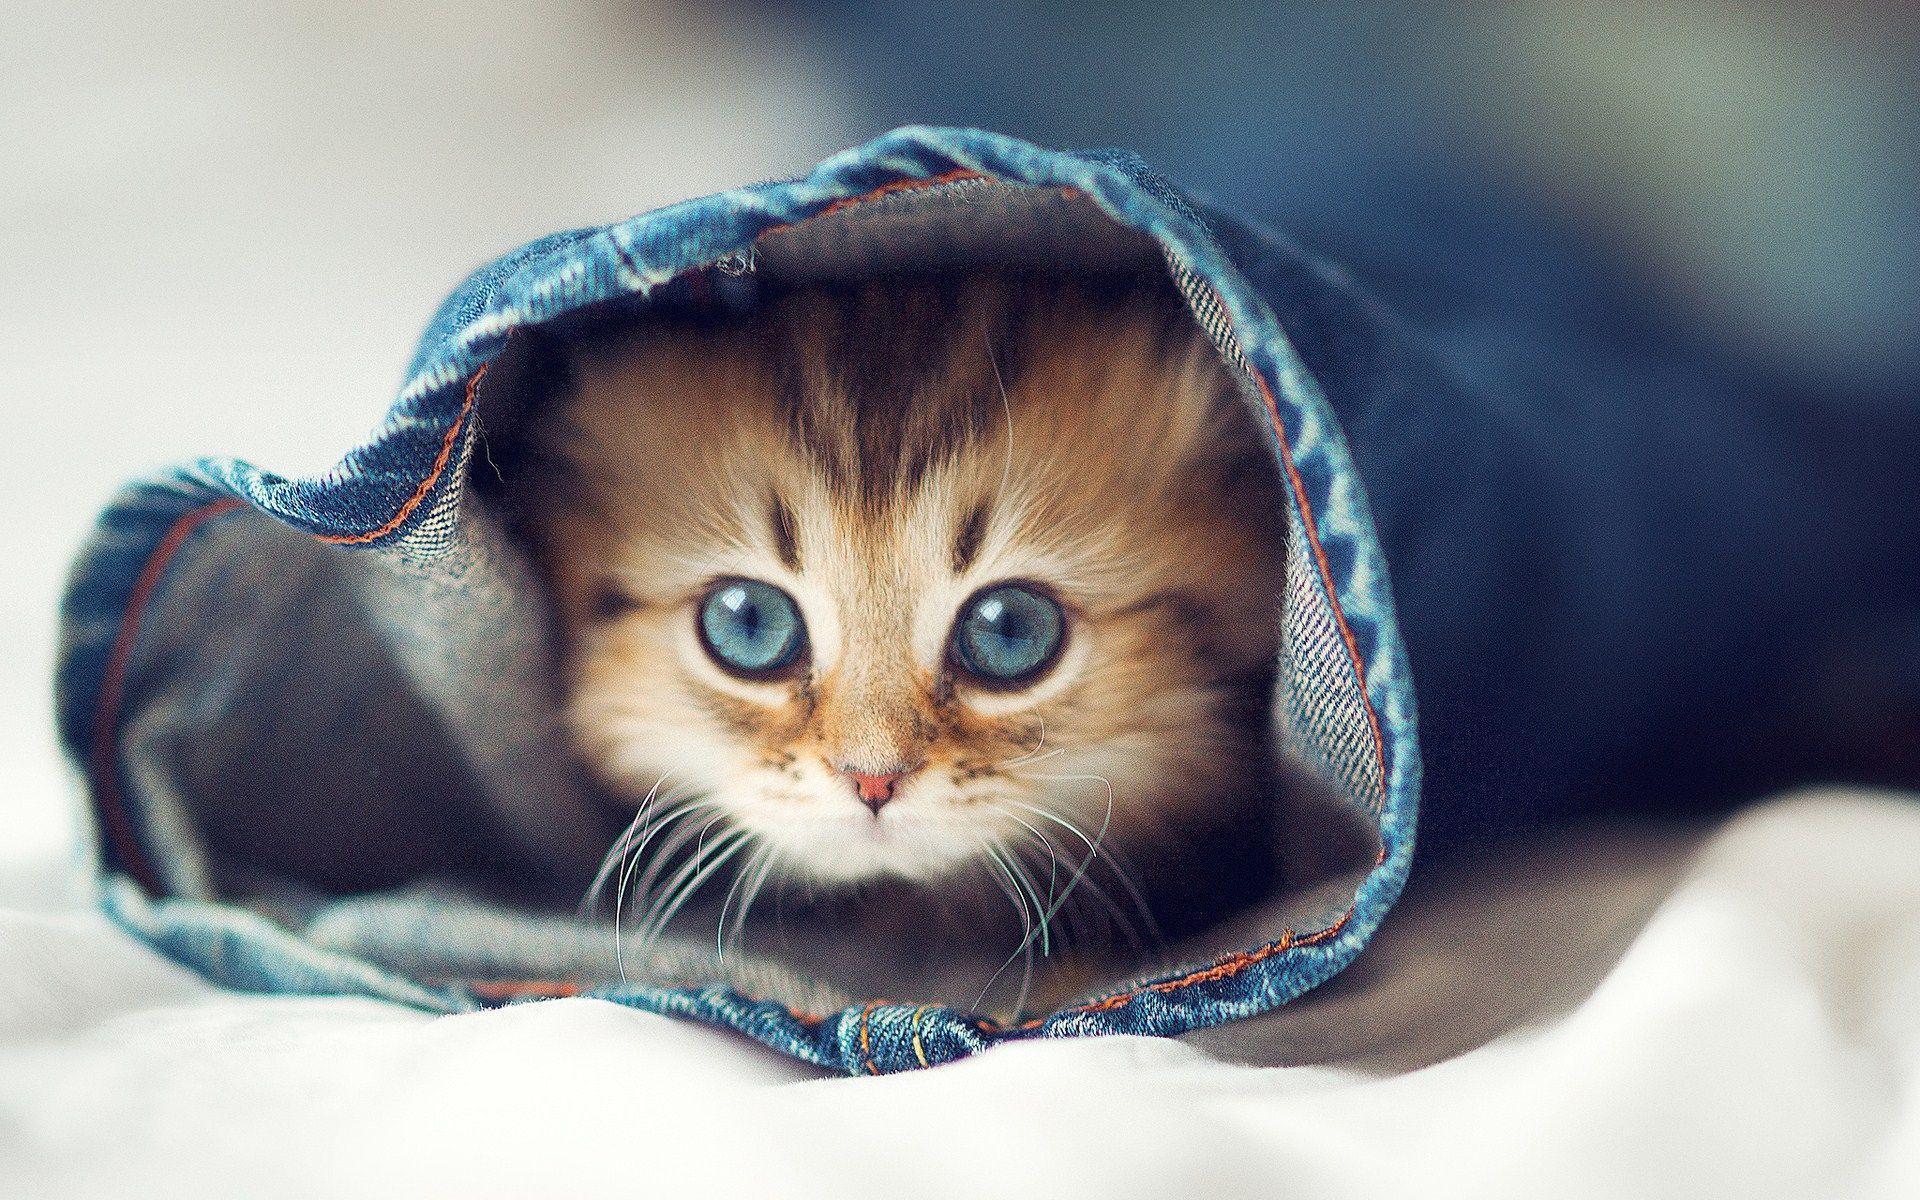 Kittens Wallpapers Download Kitten Wallpaper Border Funny Cute Cats